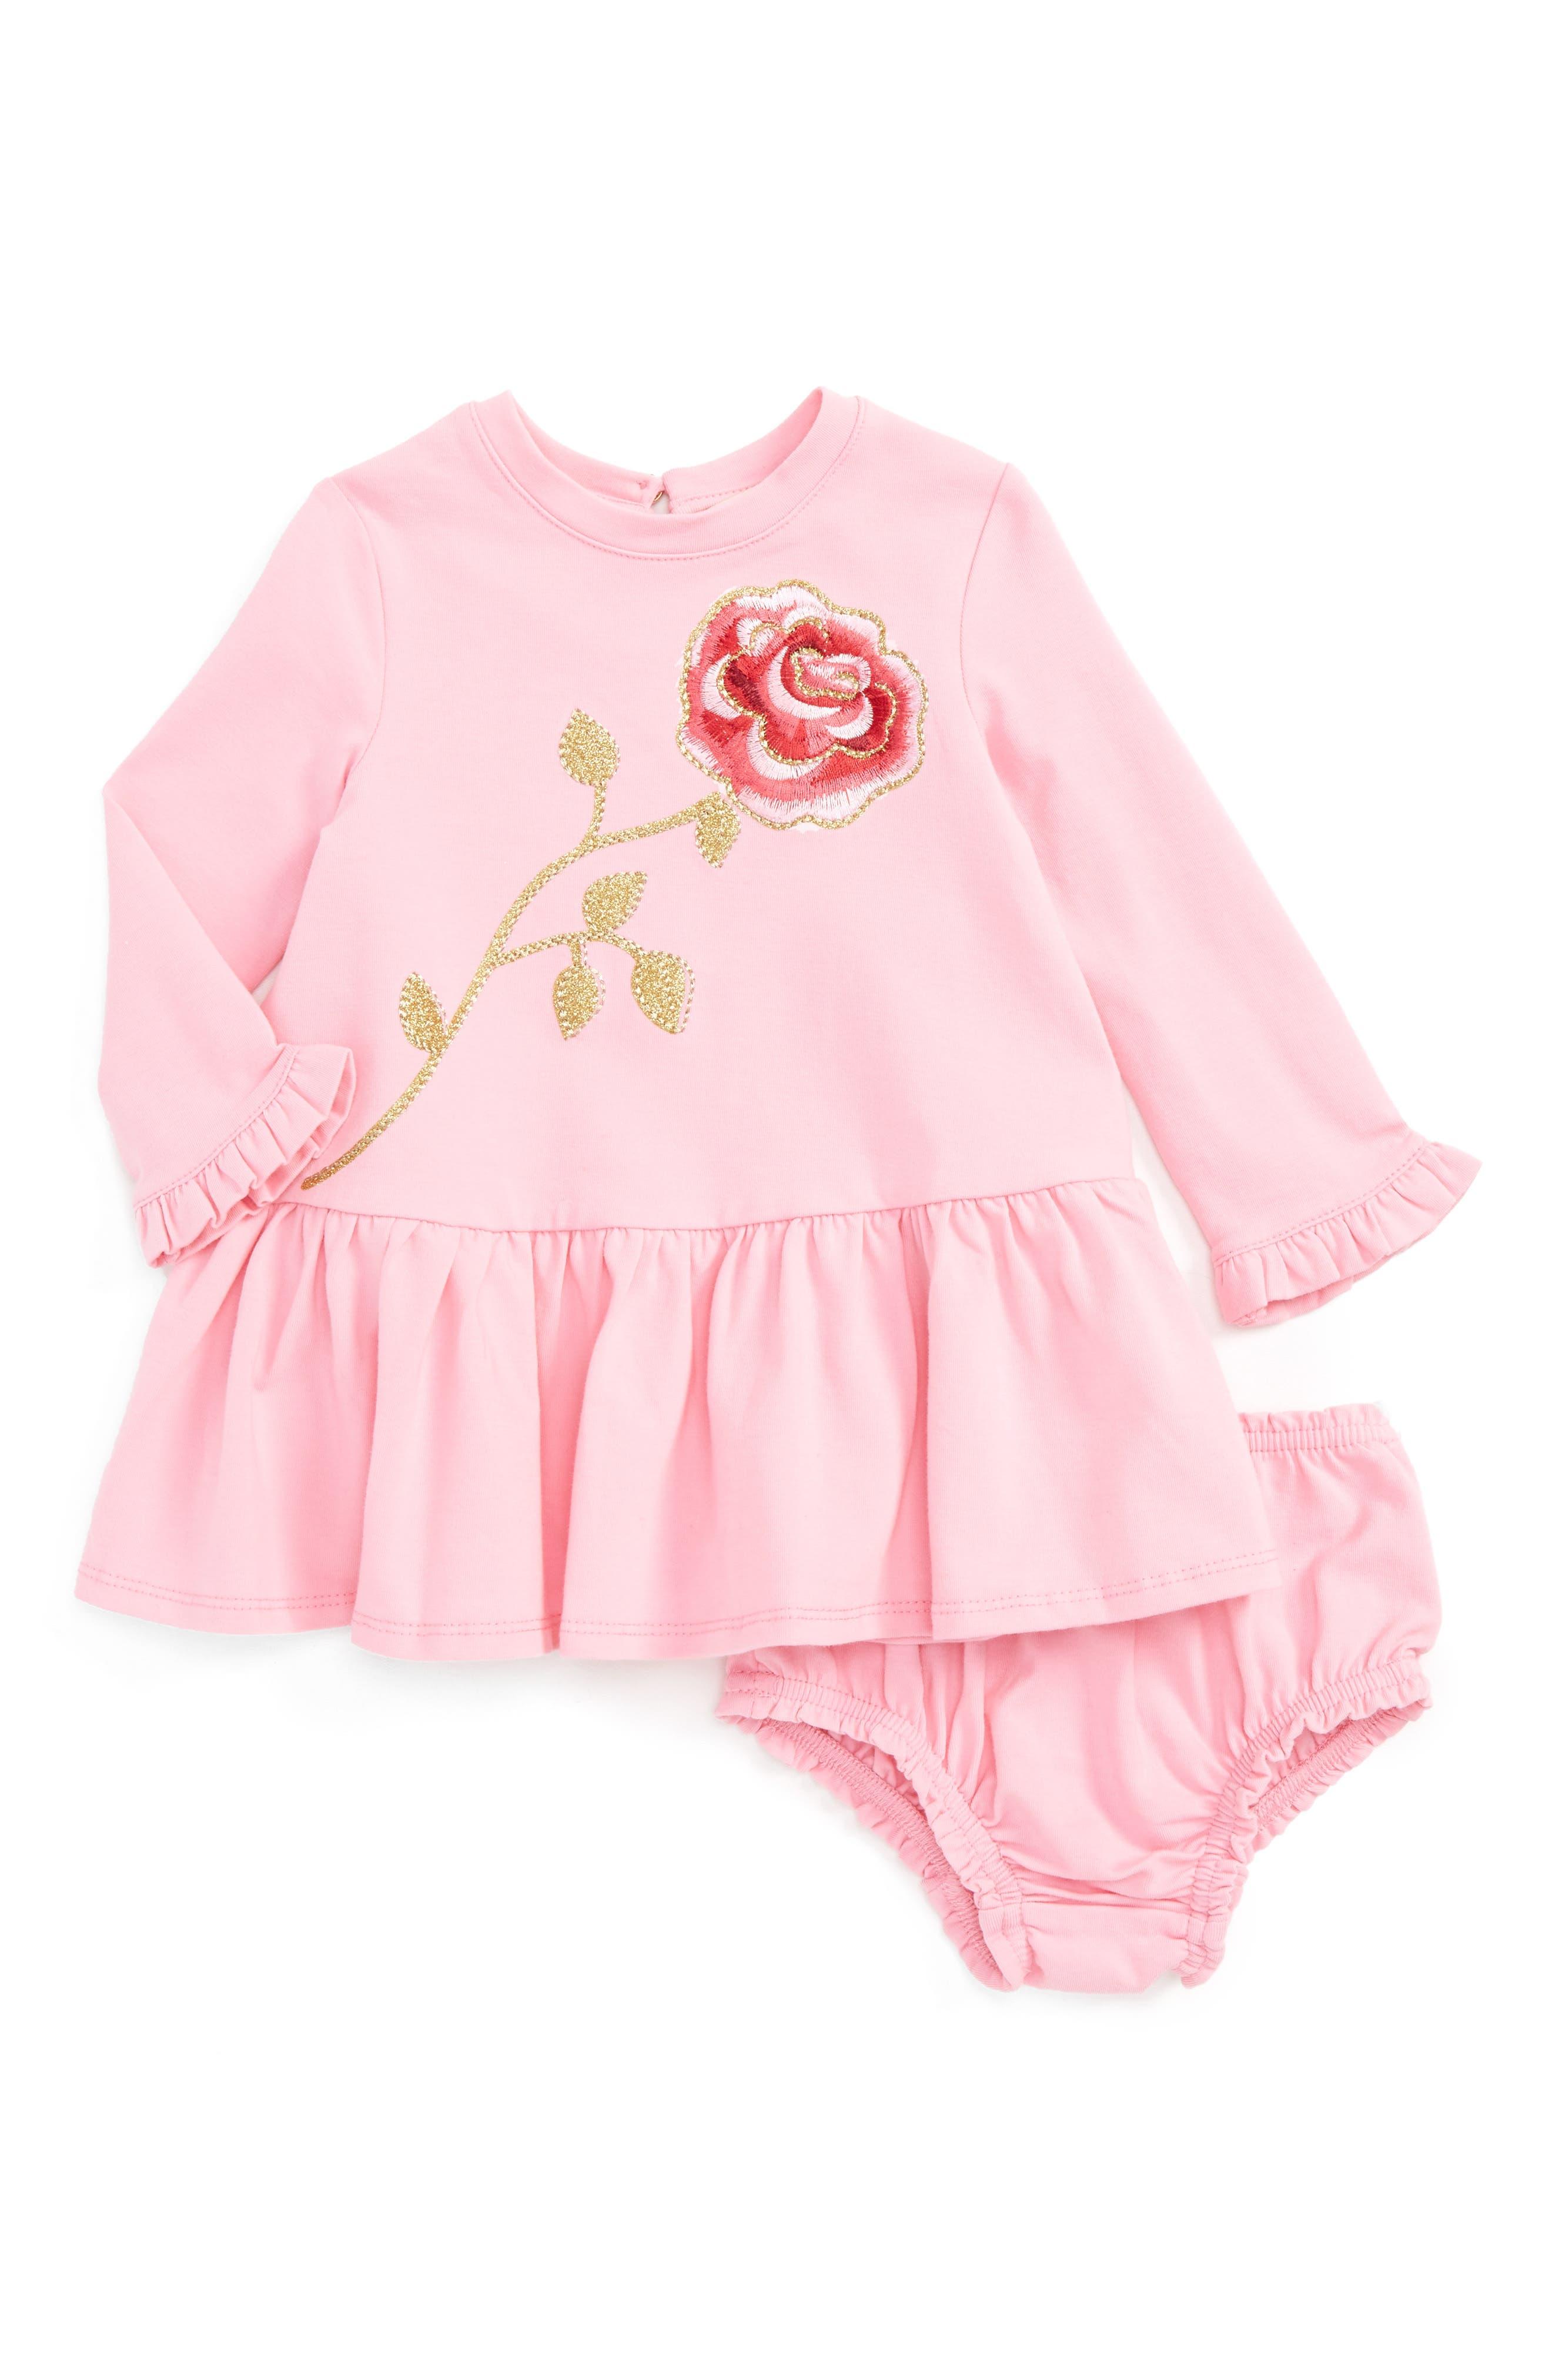 Main Image - kate spade new york rose sweatshirt dress (Baby Girls)